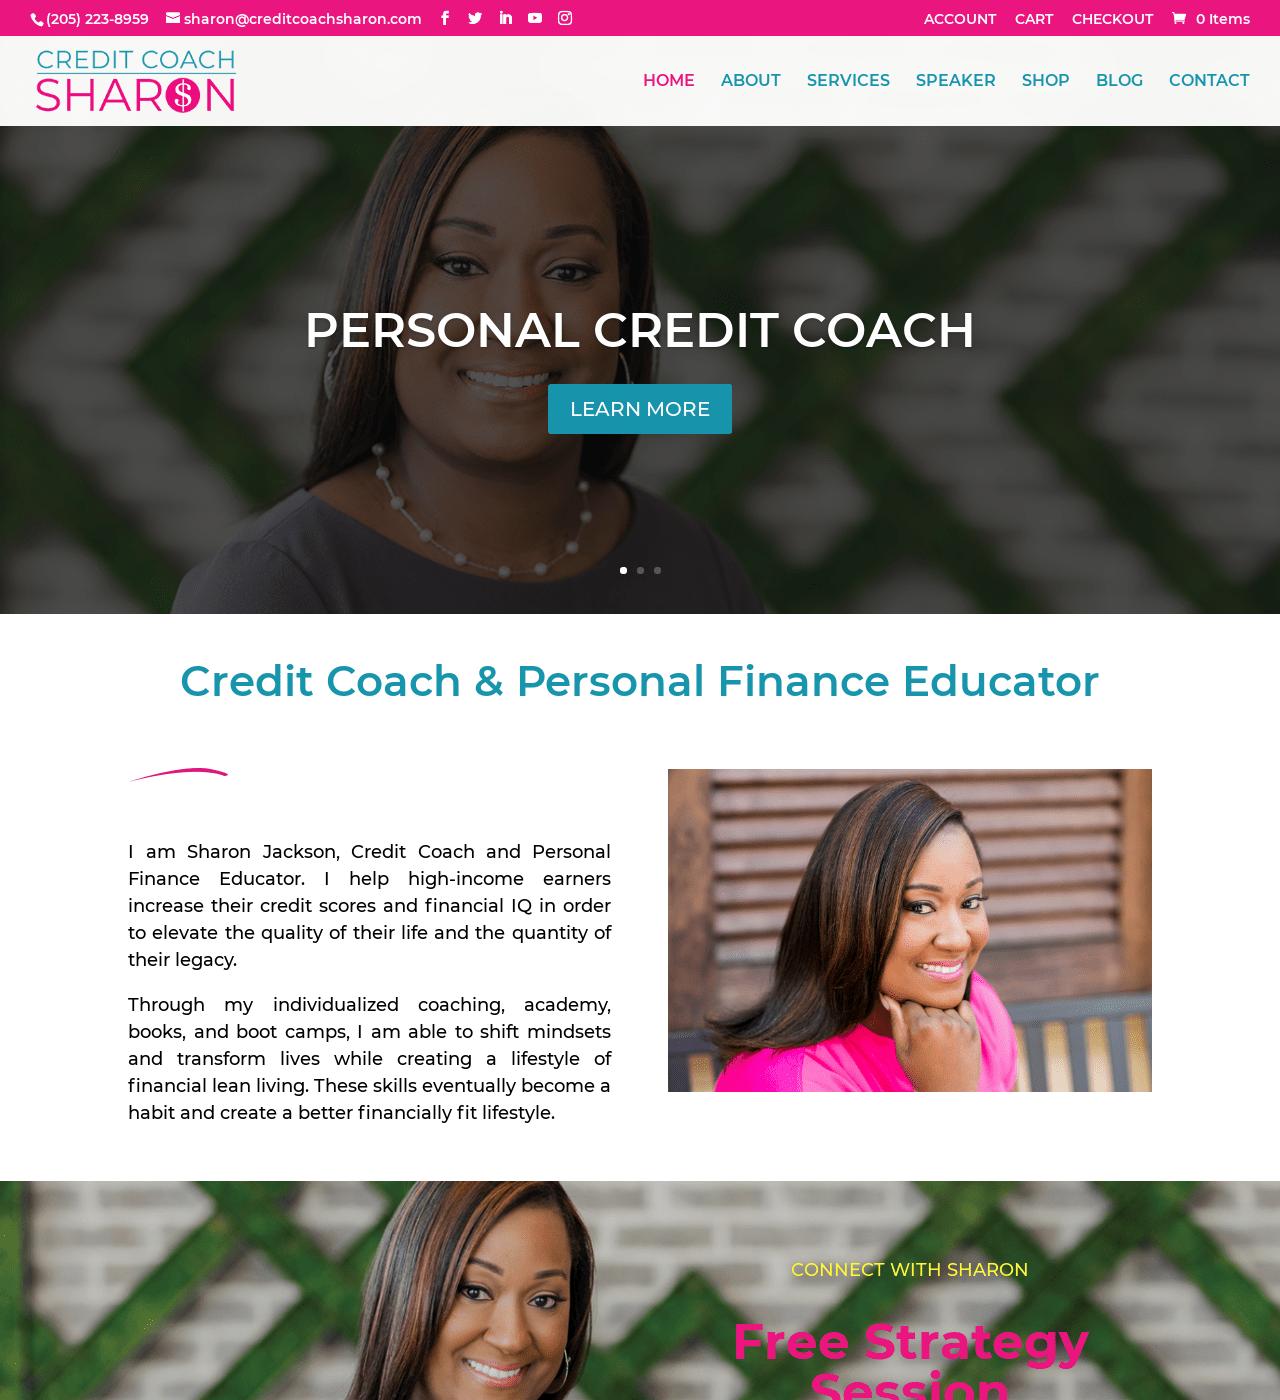 Birmingham-Web-Design-Agency-C-Kinion-Design-creditcoachsharon-com